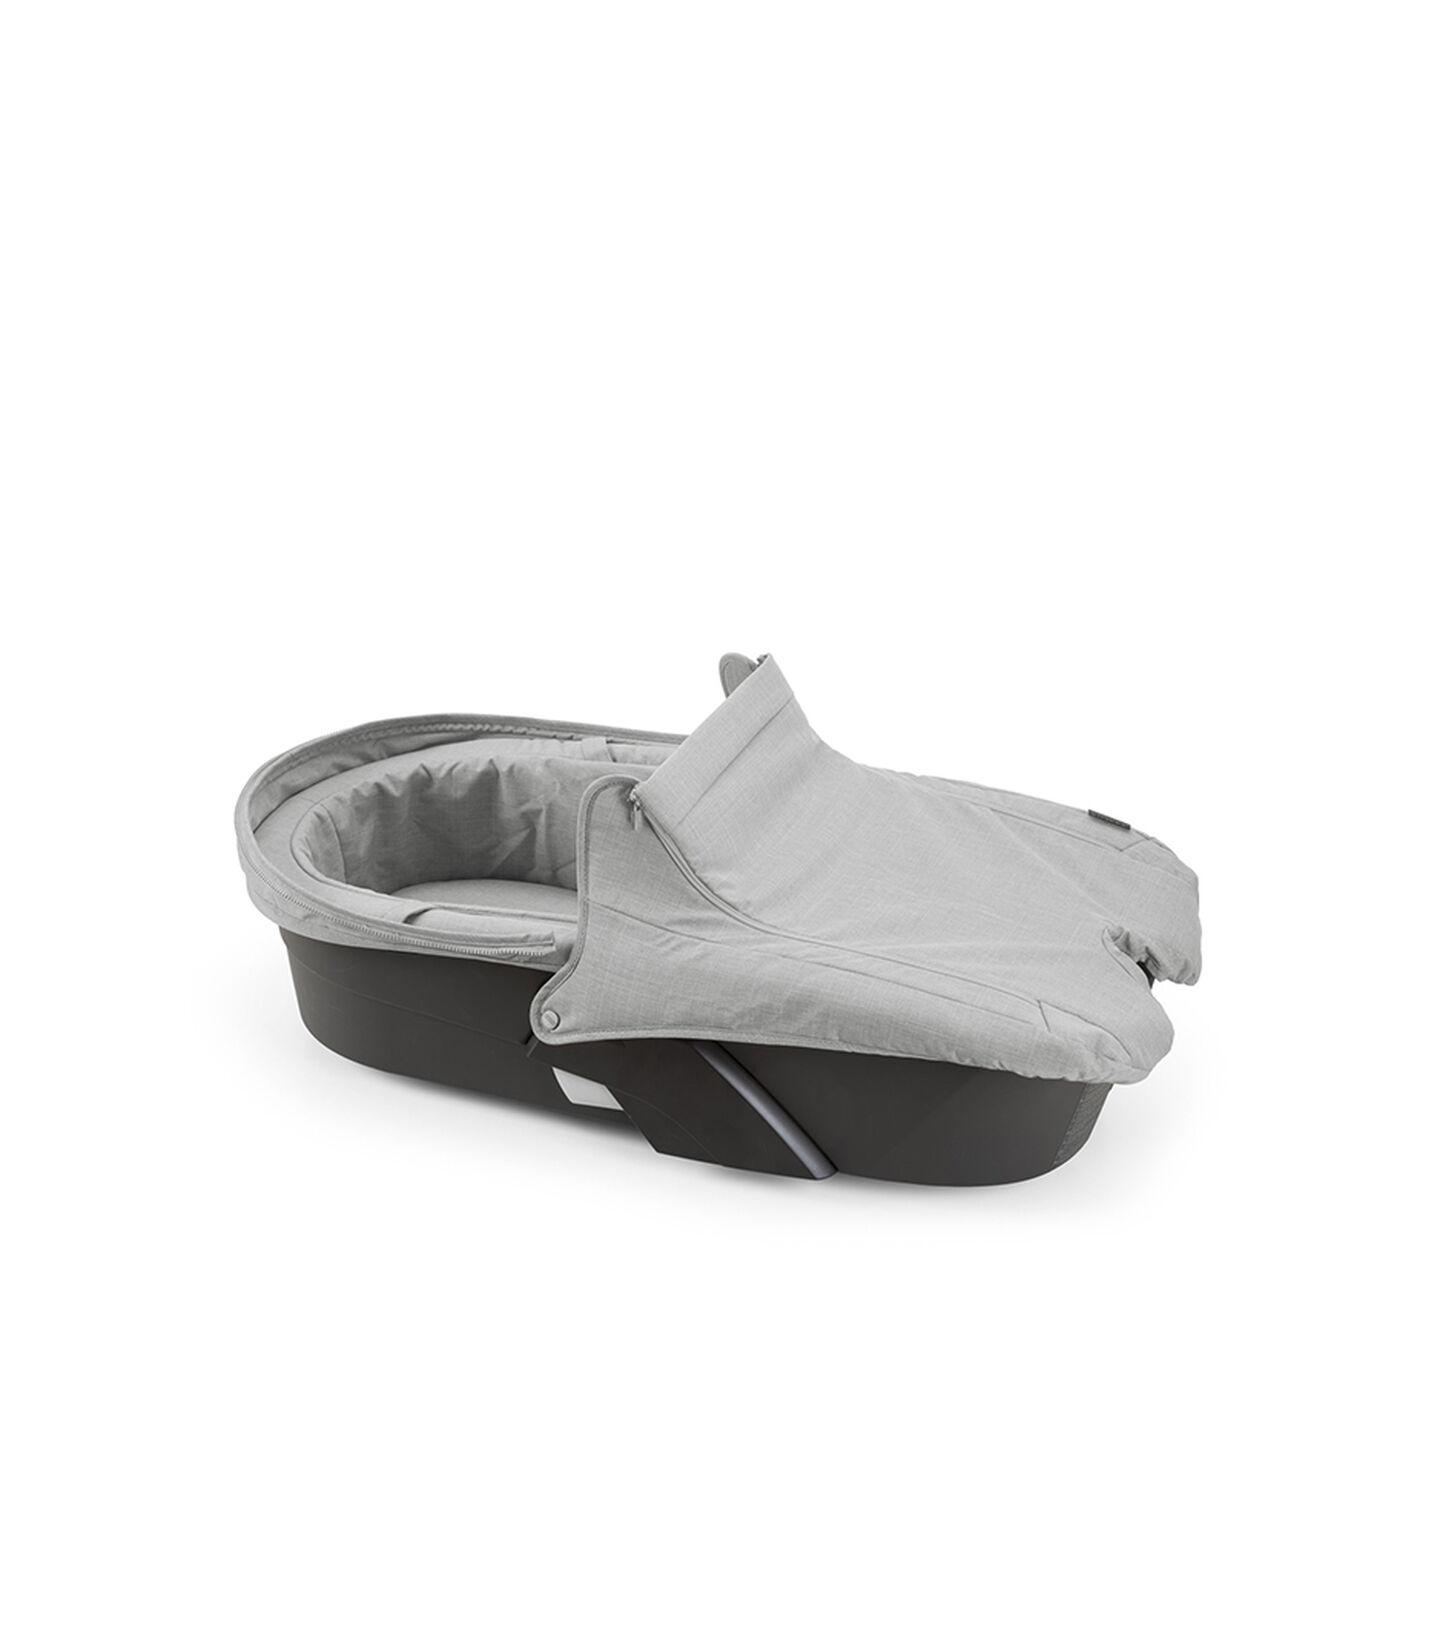 Stokke® Xplory® Carry Cot Cover Grey Melange, Gris Melange, mainview